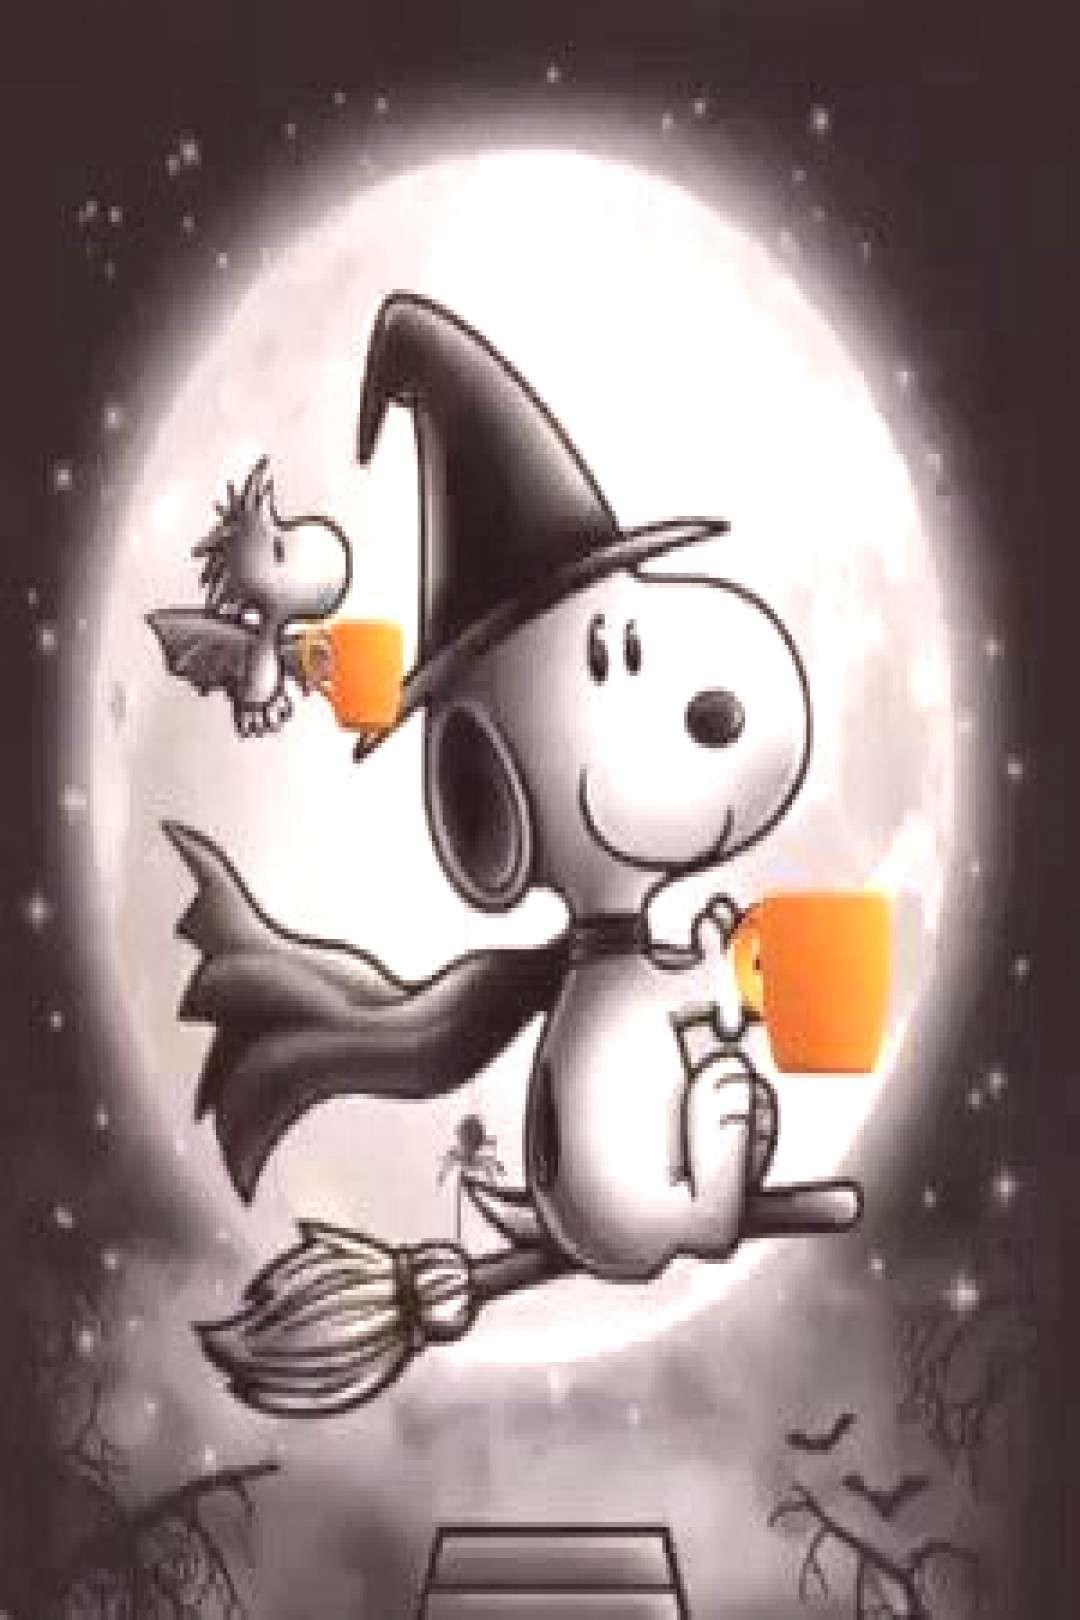 Snoopy & Woodstock celebrating Halloween.Snoopy in 2020